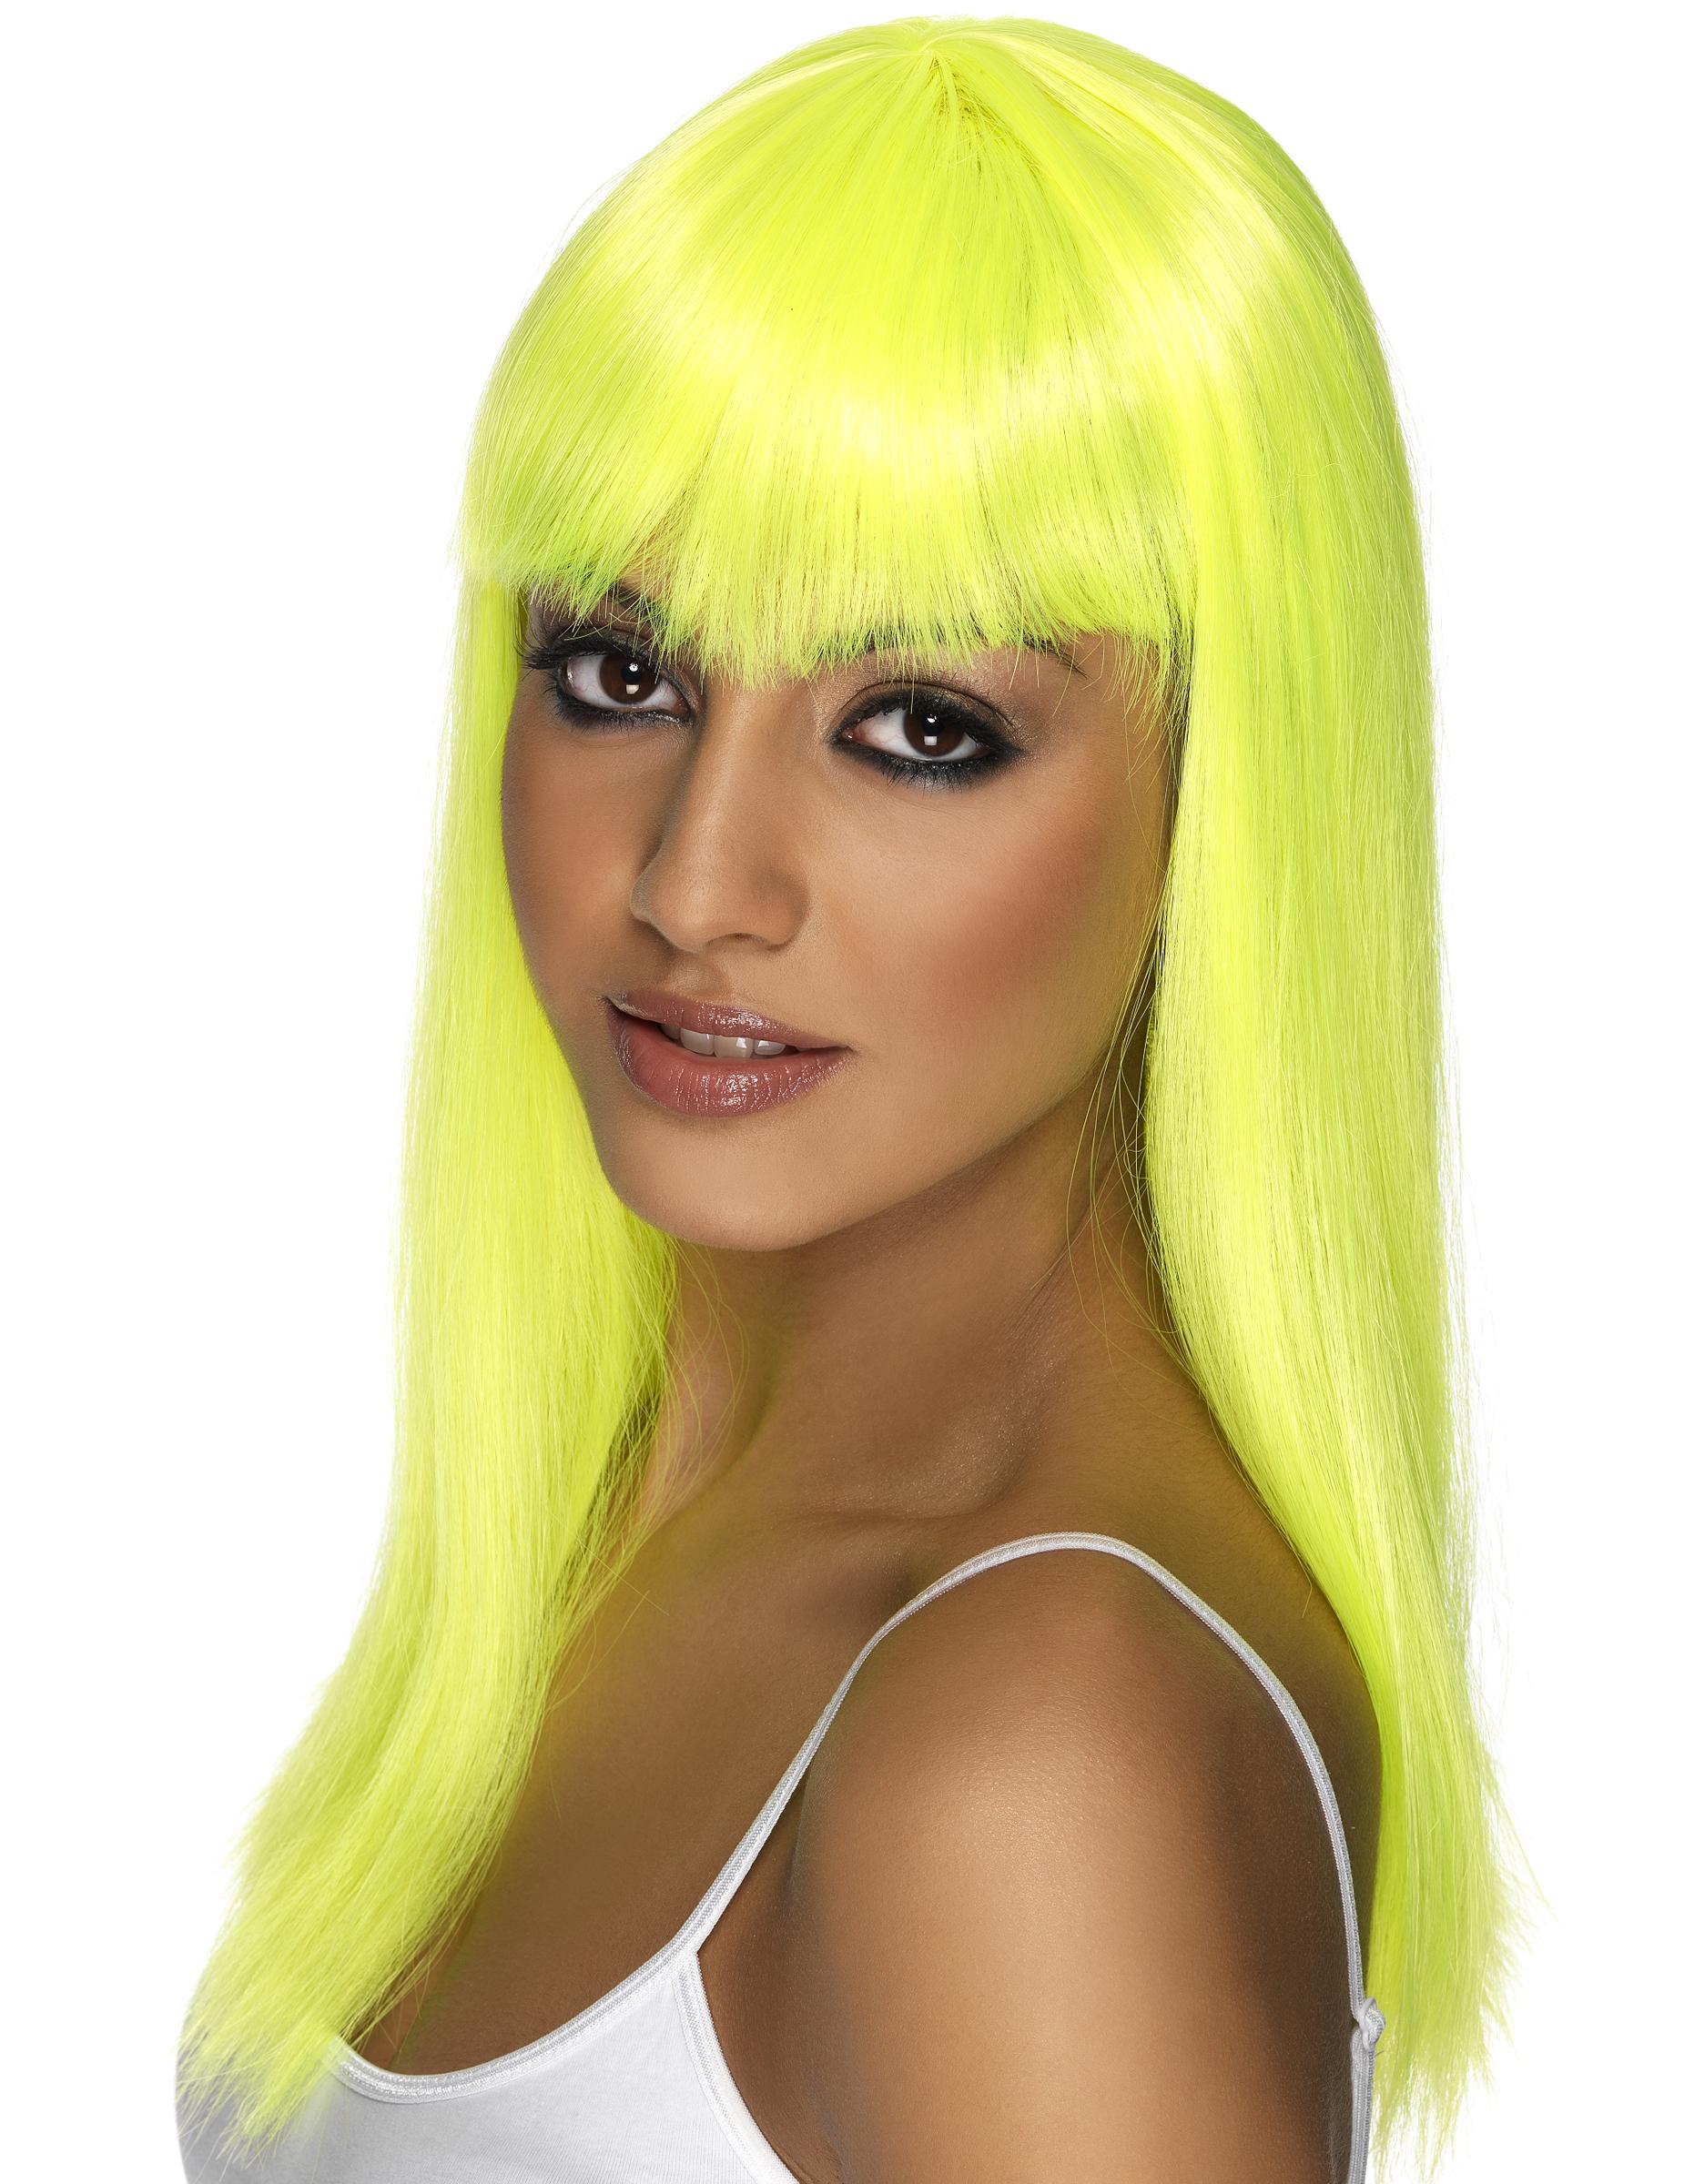 d6d9ec8af116 Parrucca da donna gialla fluorescente su VegaooParty, negozio di ...